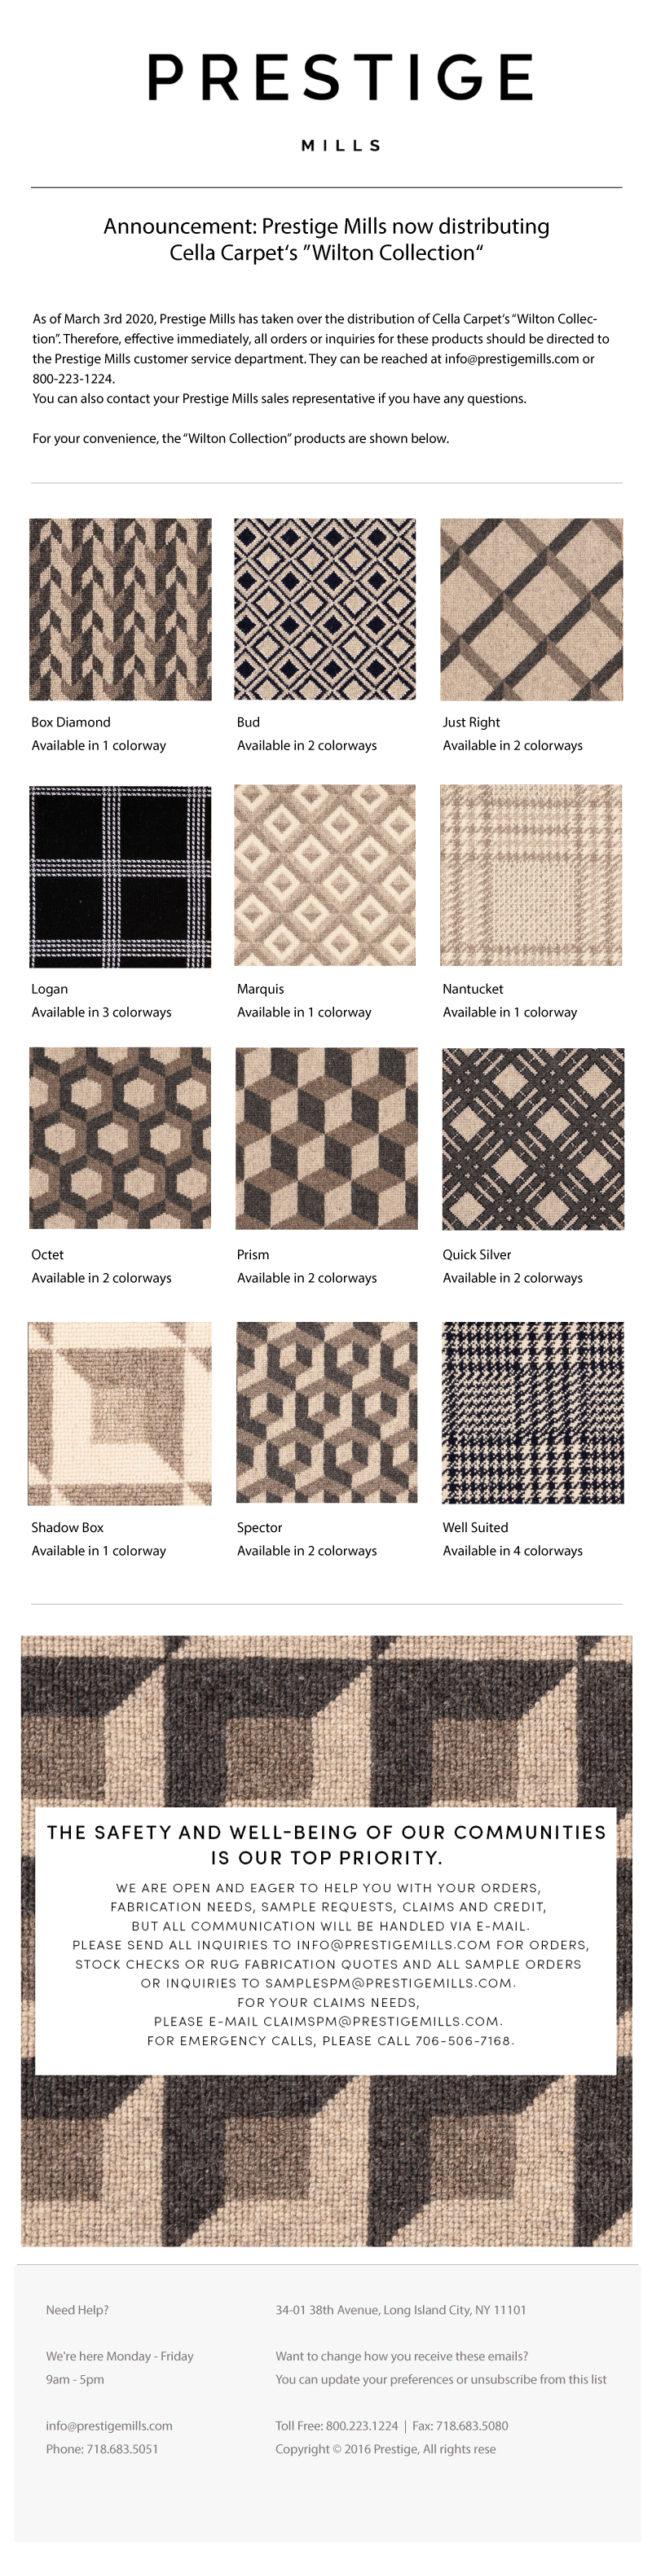 NEW: Prestige Mills - Cella Carpet